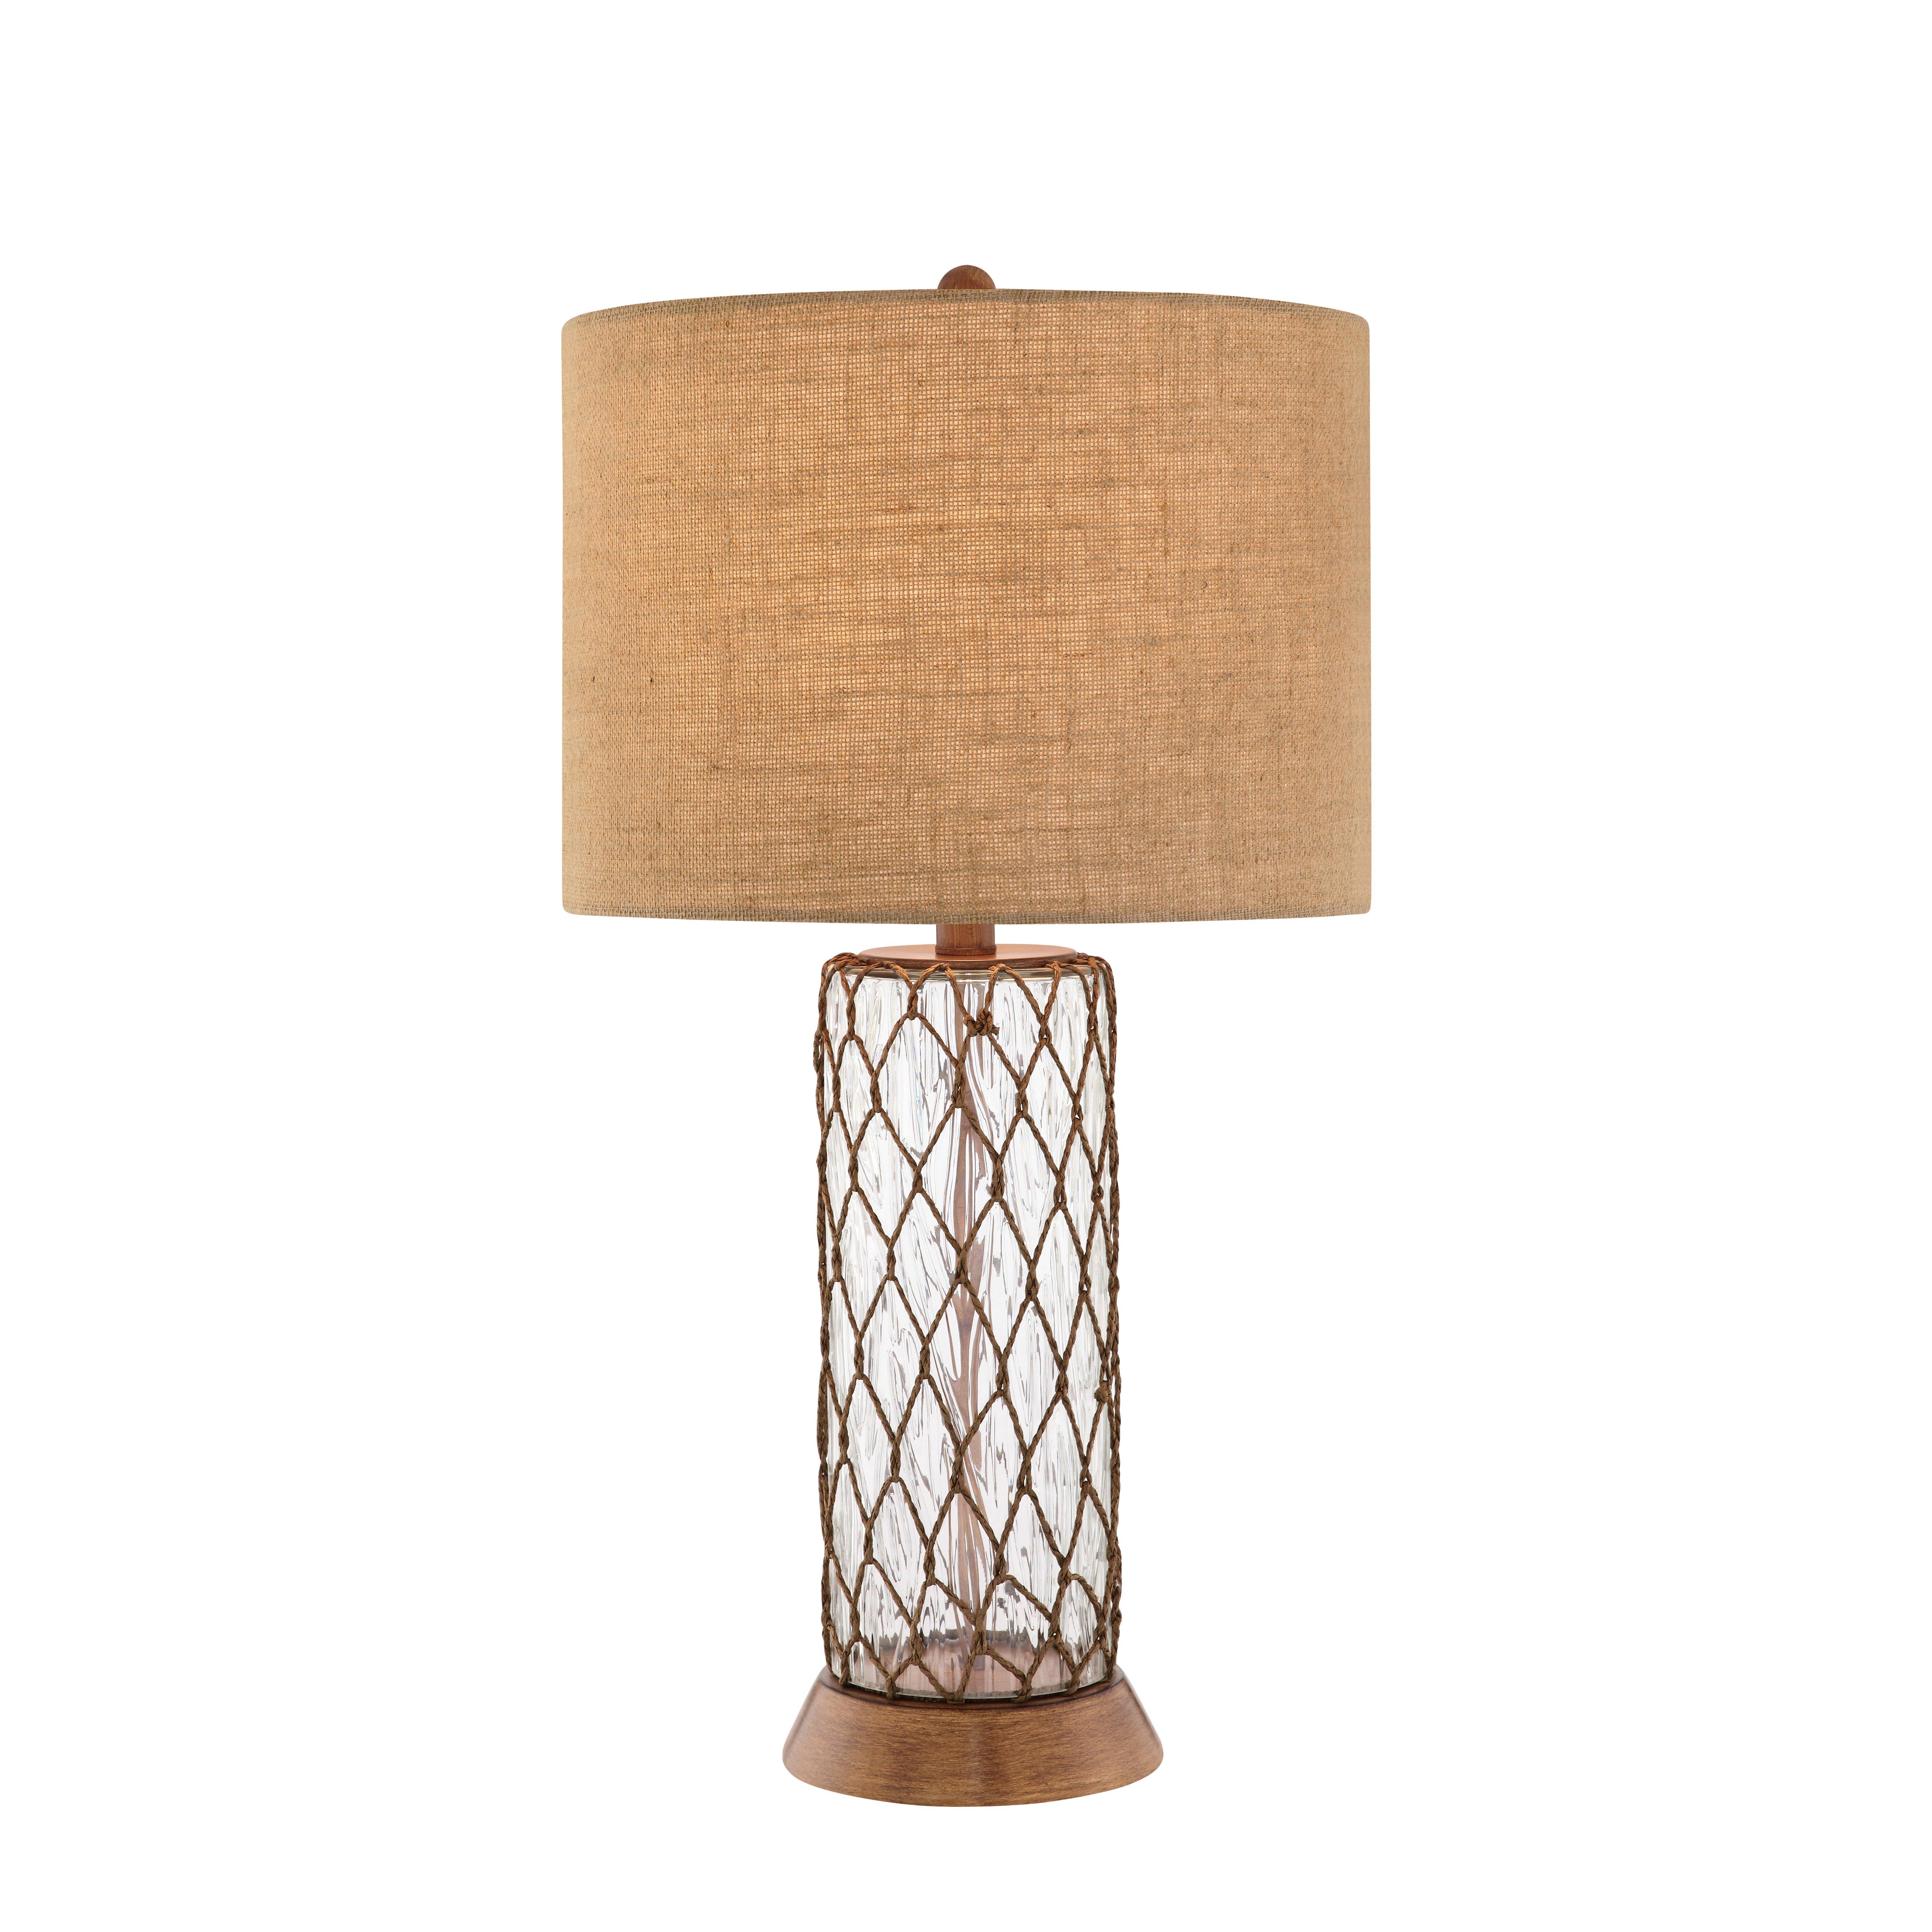 catalina lighting 32 table lamp reviews wayfair. Black Bedroom Furniture Sets. Home Design Ideas